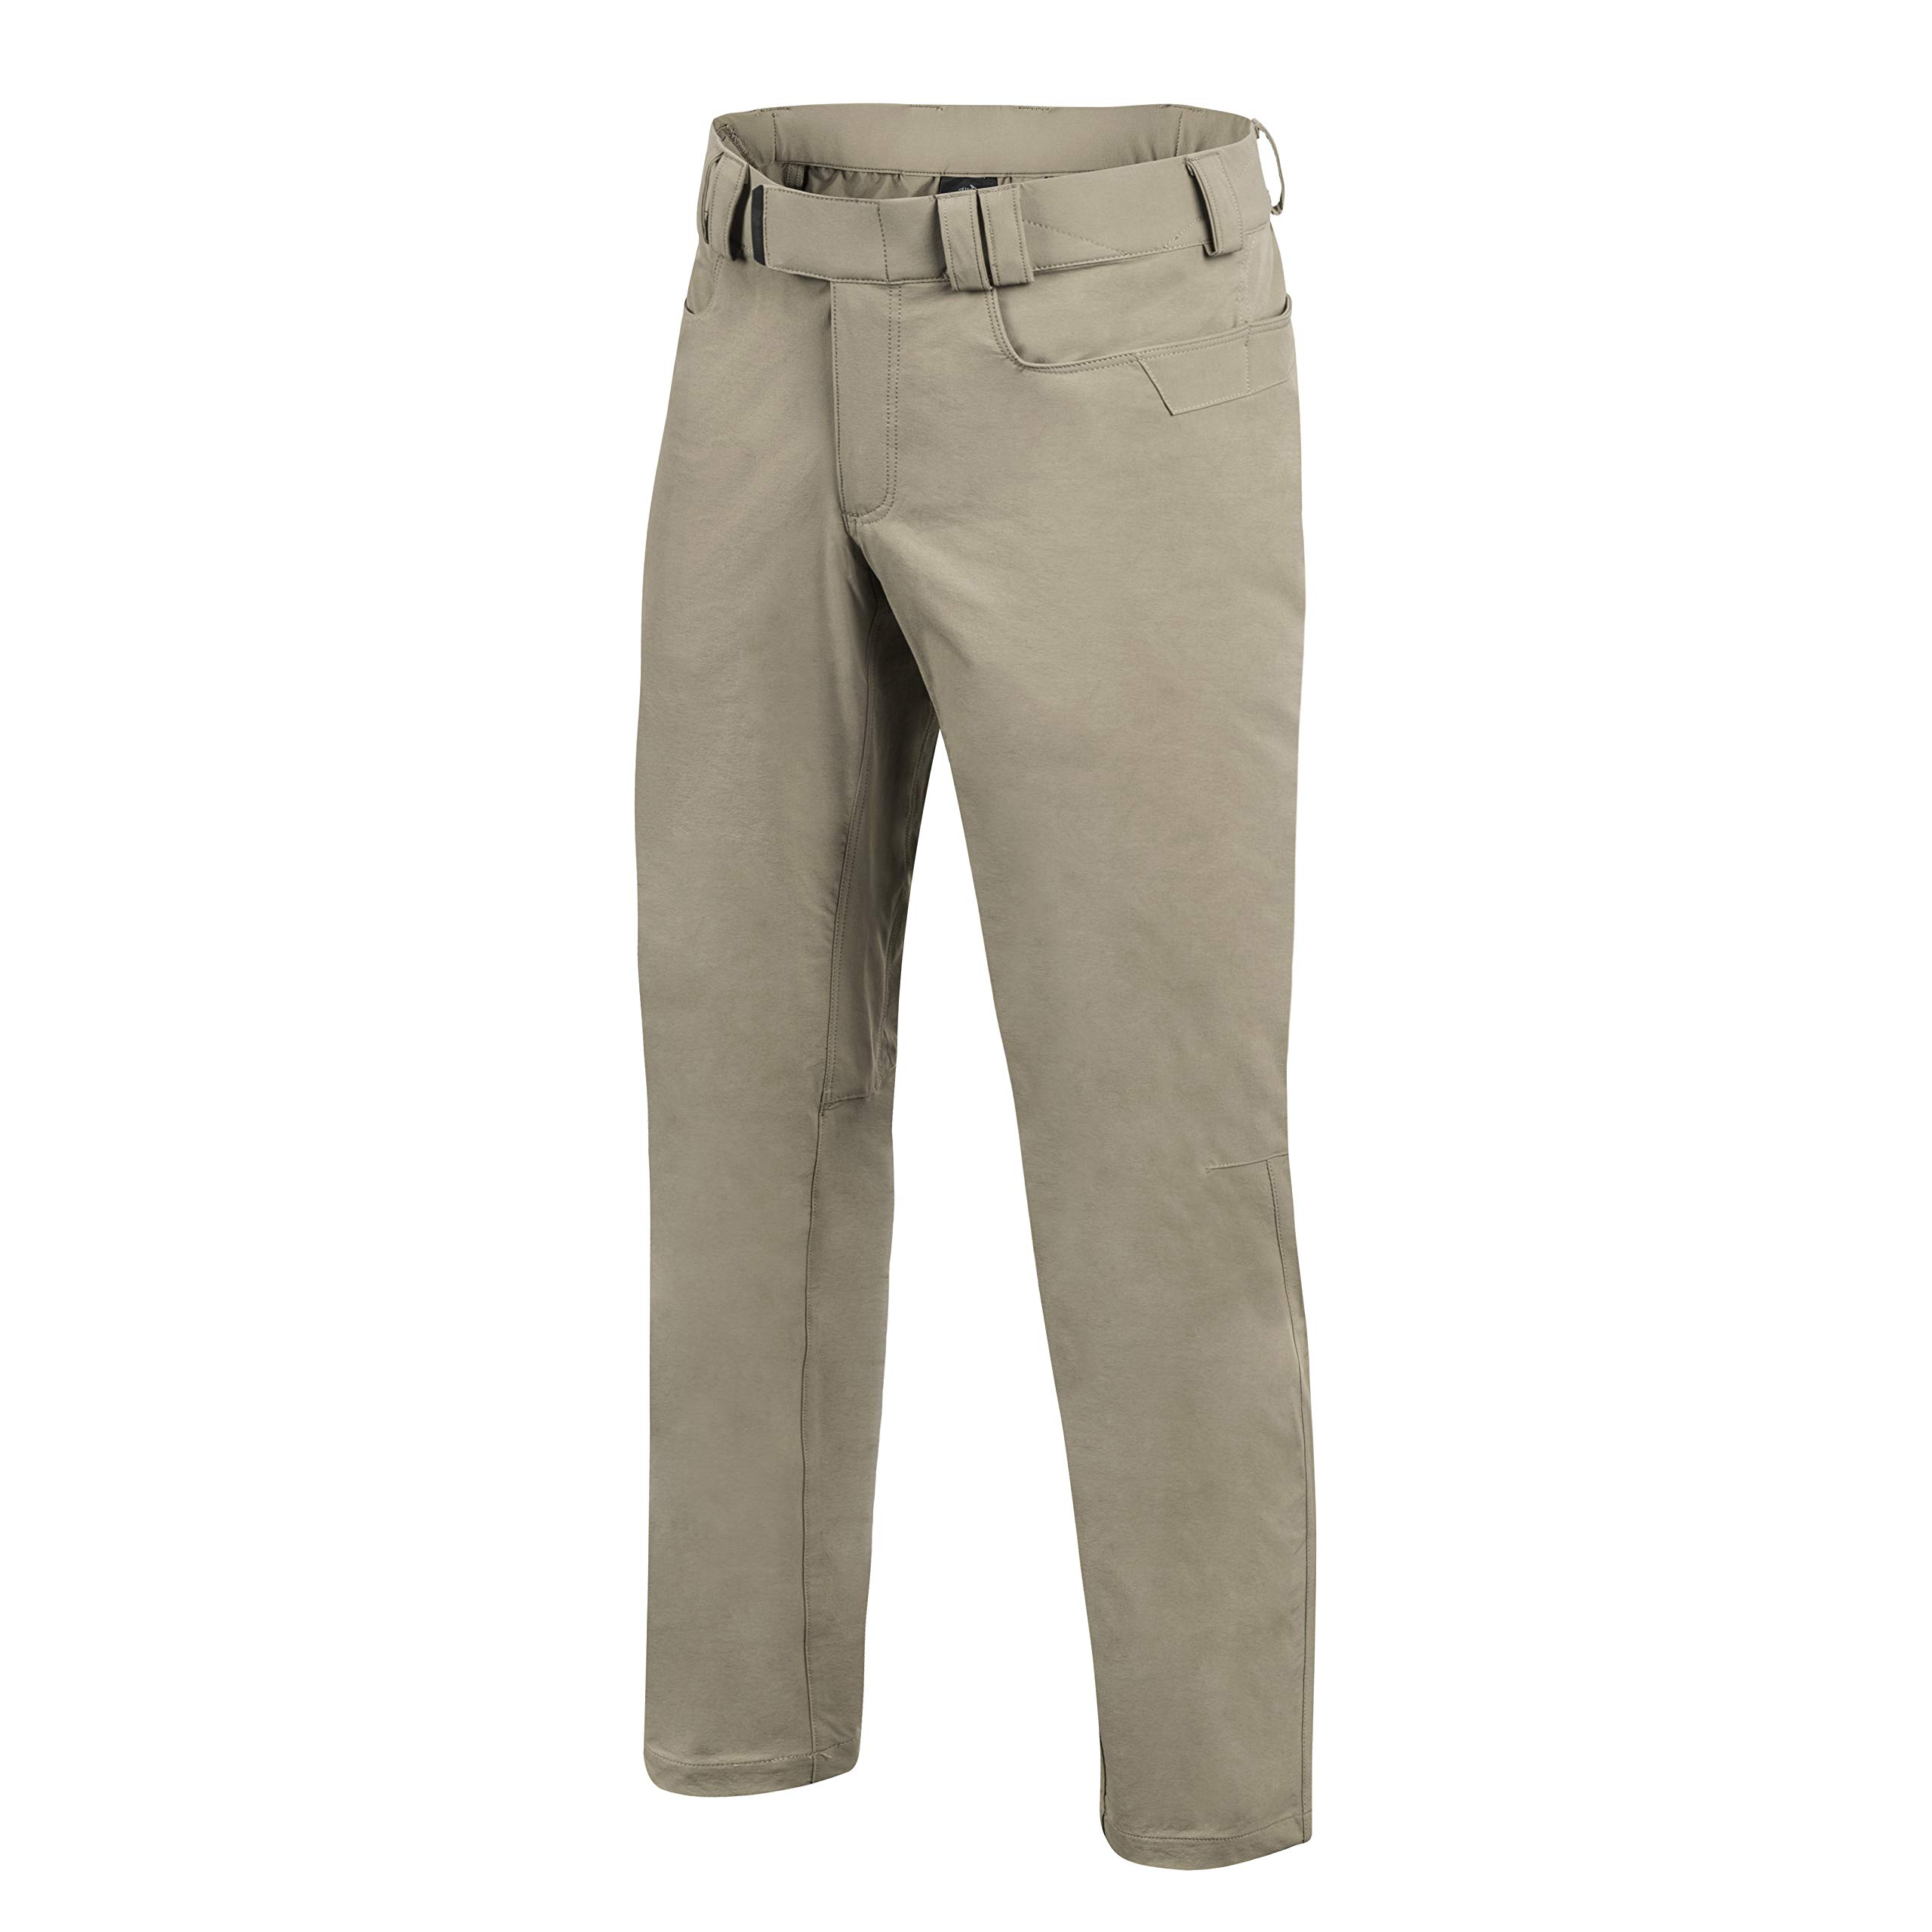 Helikon-Tex CTP Covert Tactical Pants, Urban Line